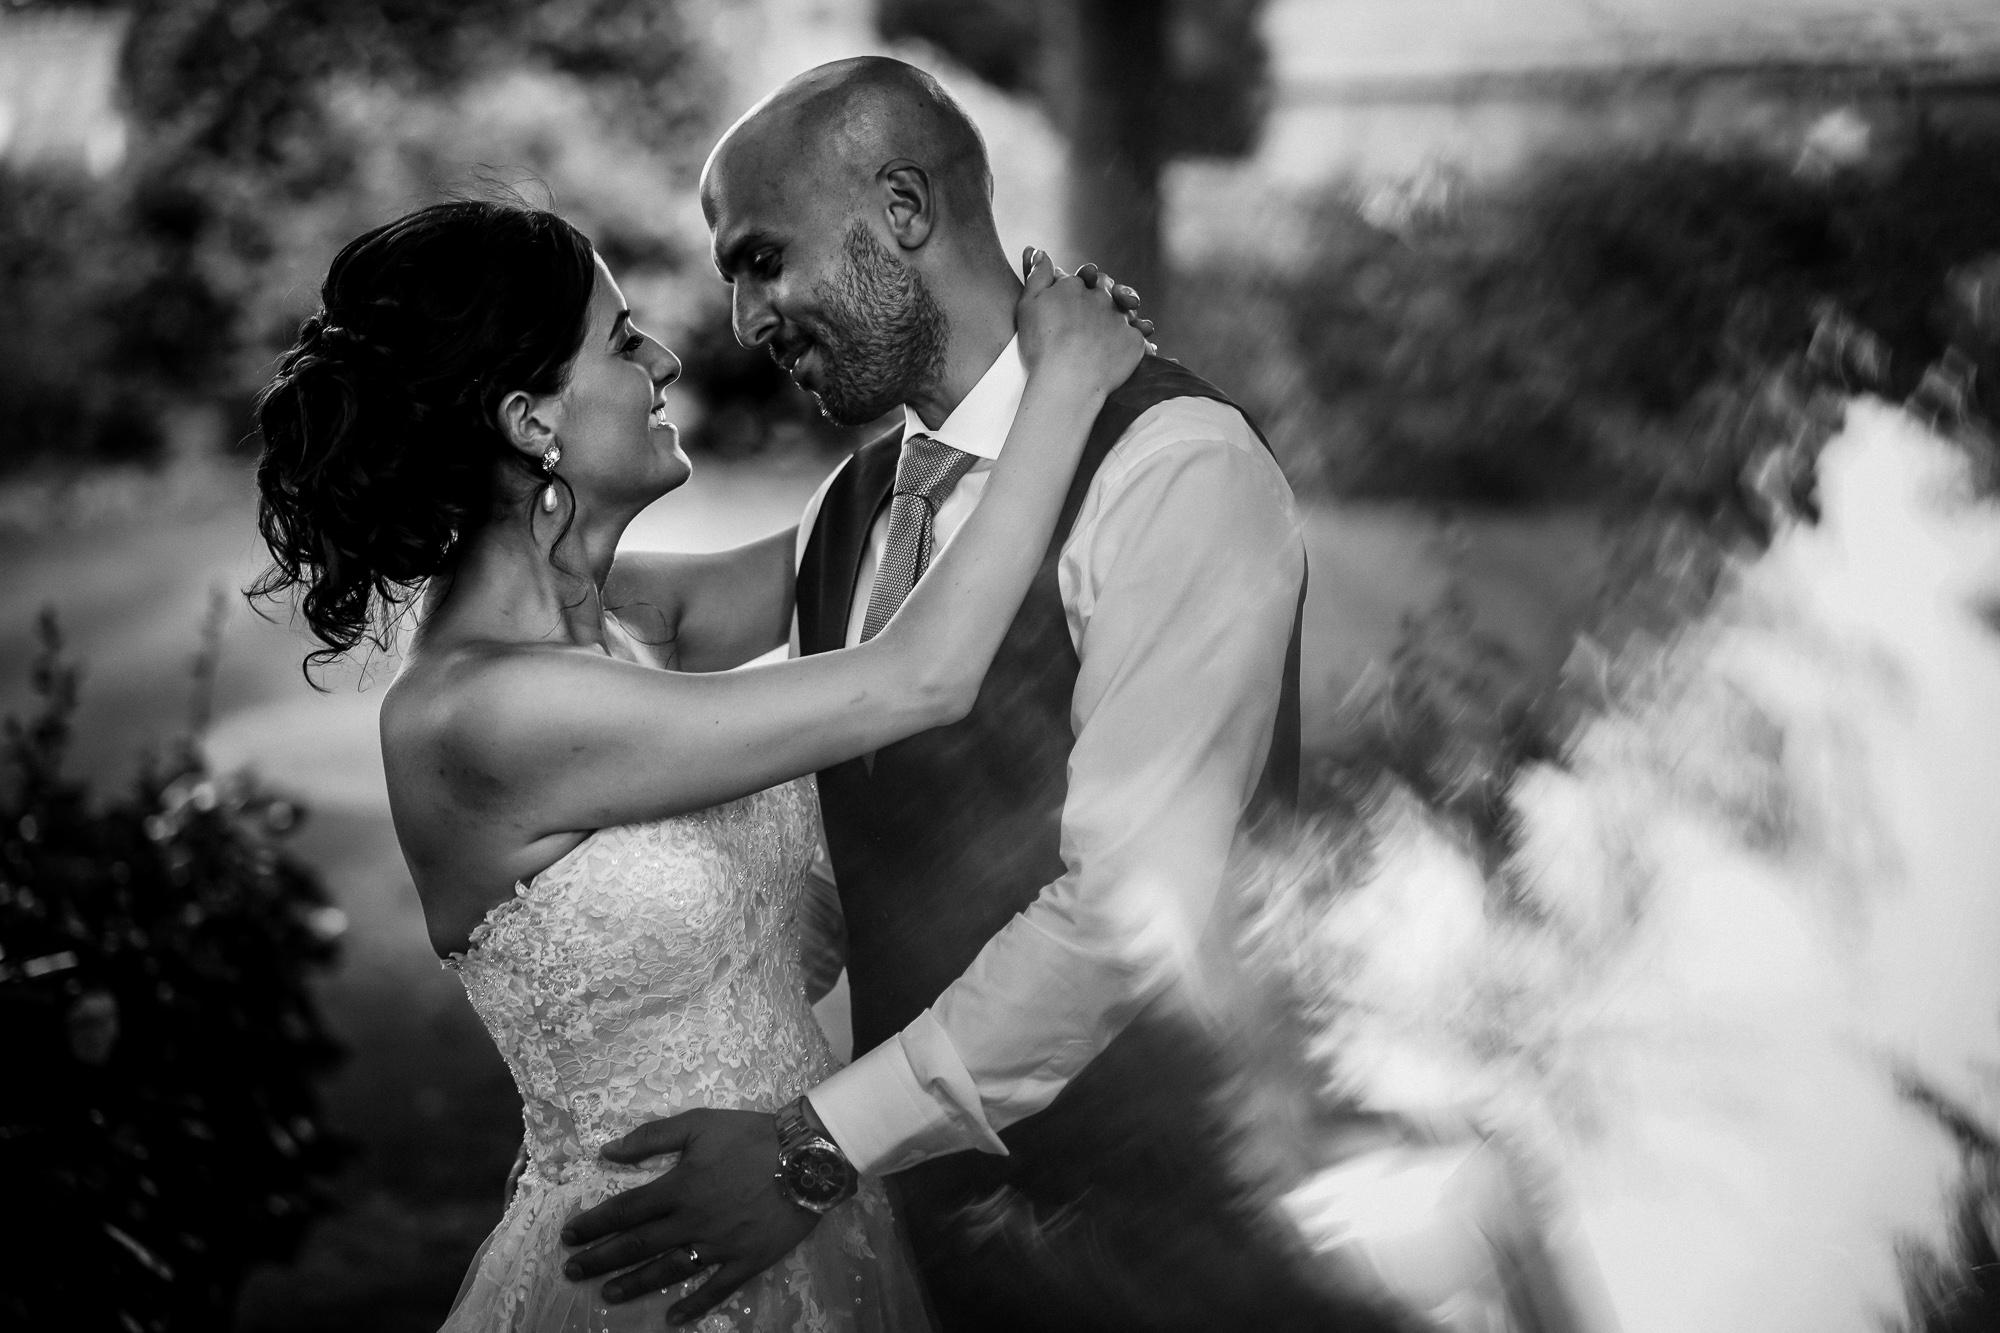 West Tower Wedding Venue Orkskirk Lancashire Wedding Photography cheshire wedding photographer (43 of 47).jpg